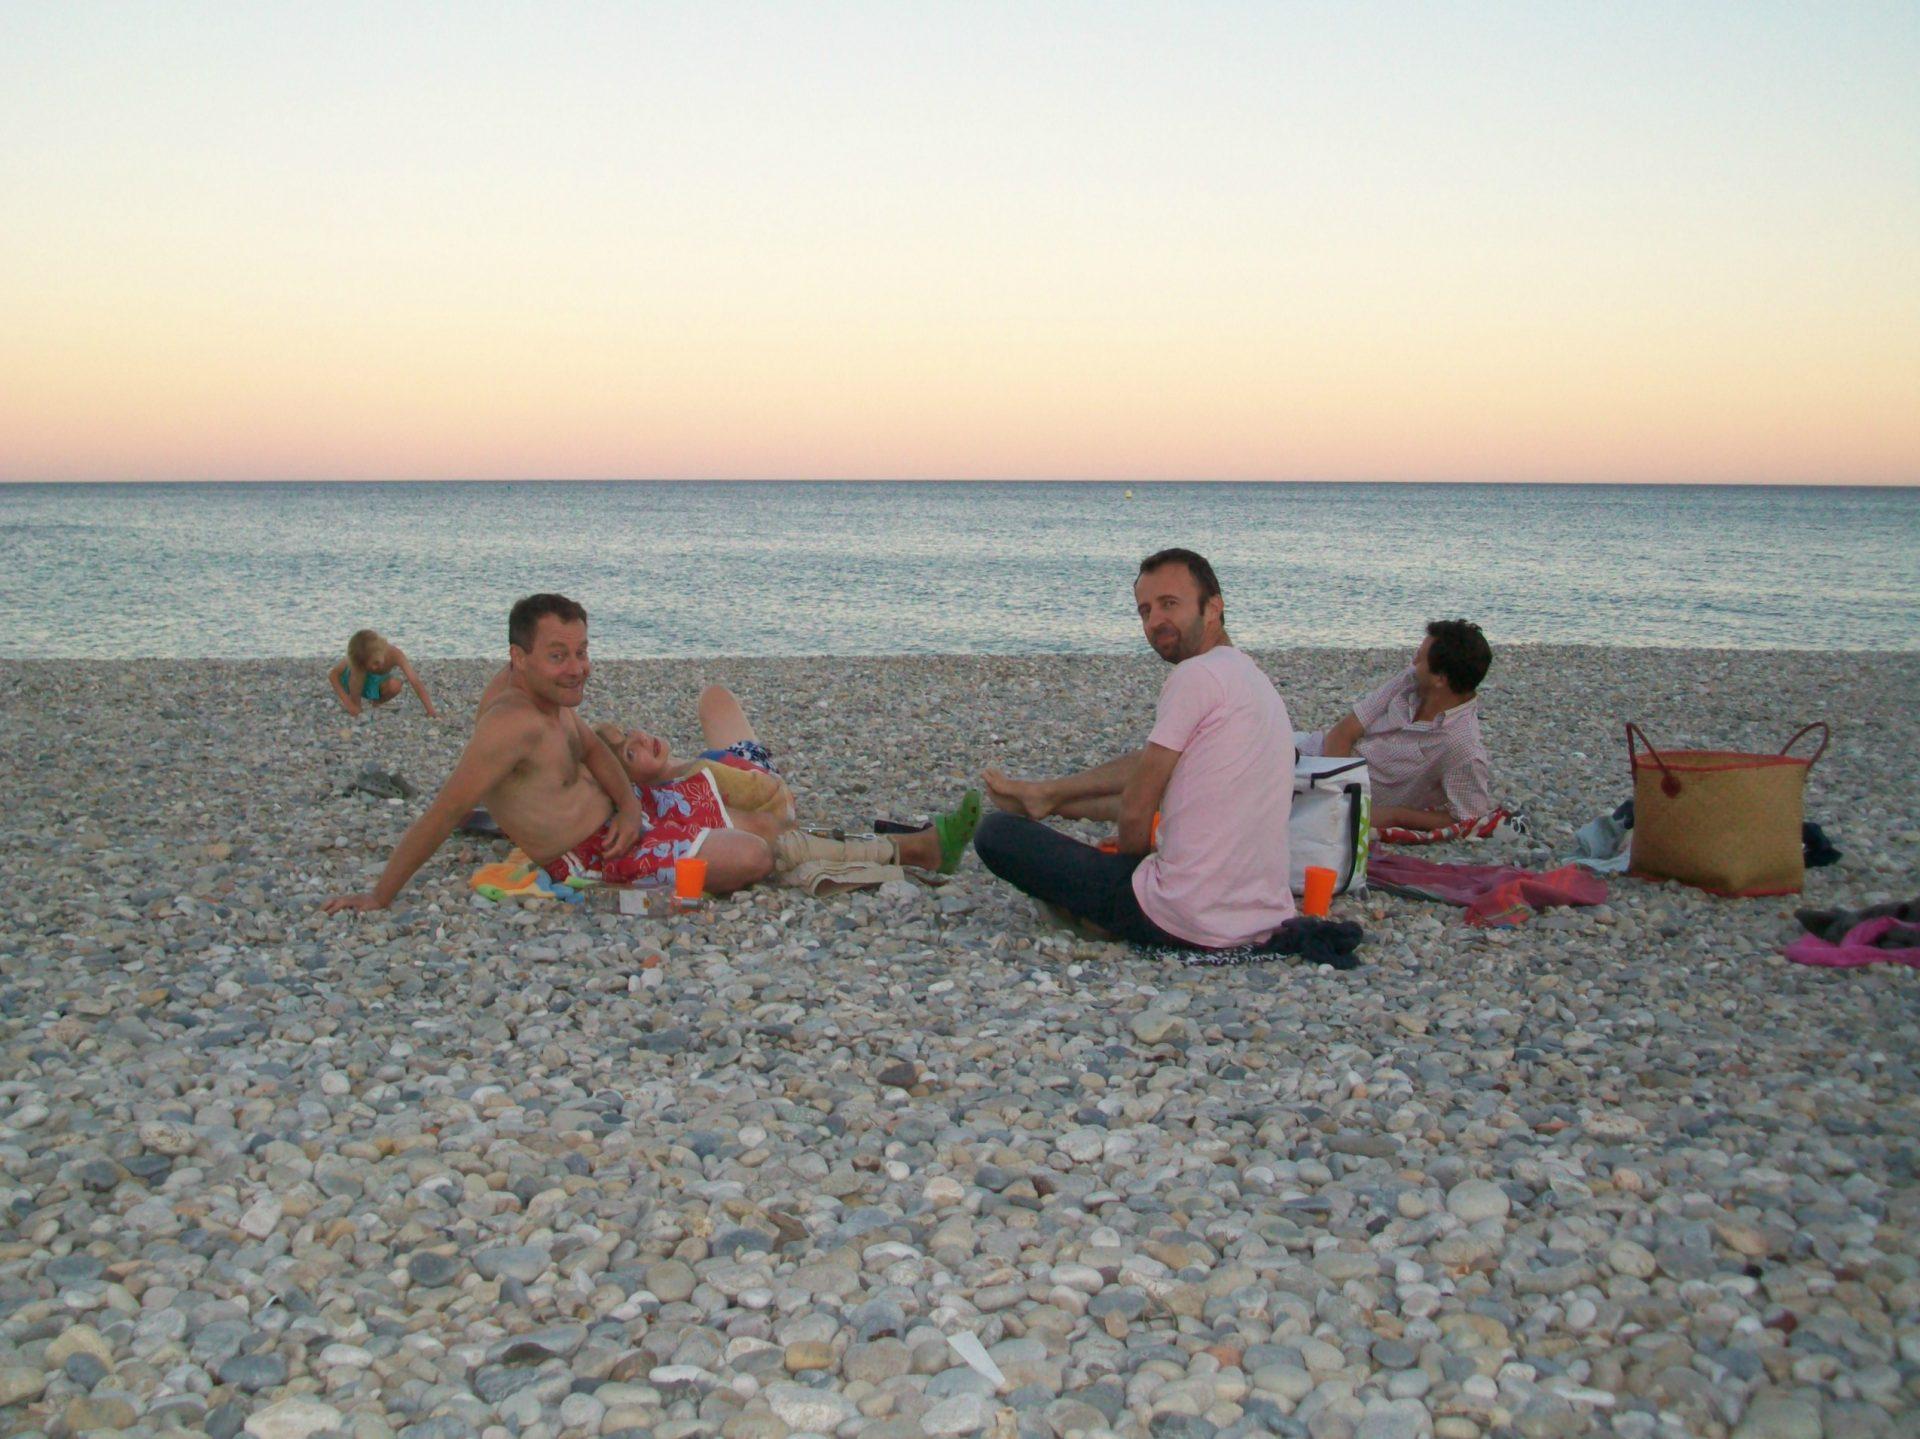 picnic rosy beach